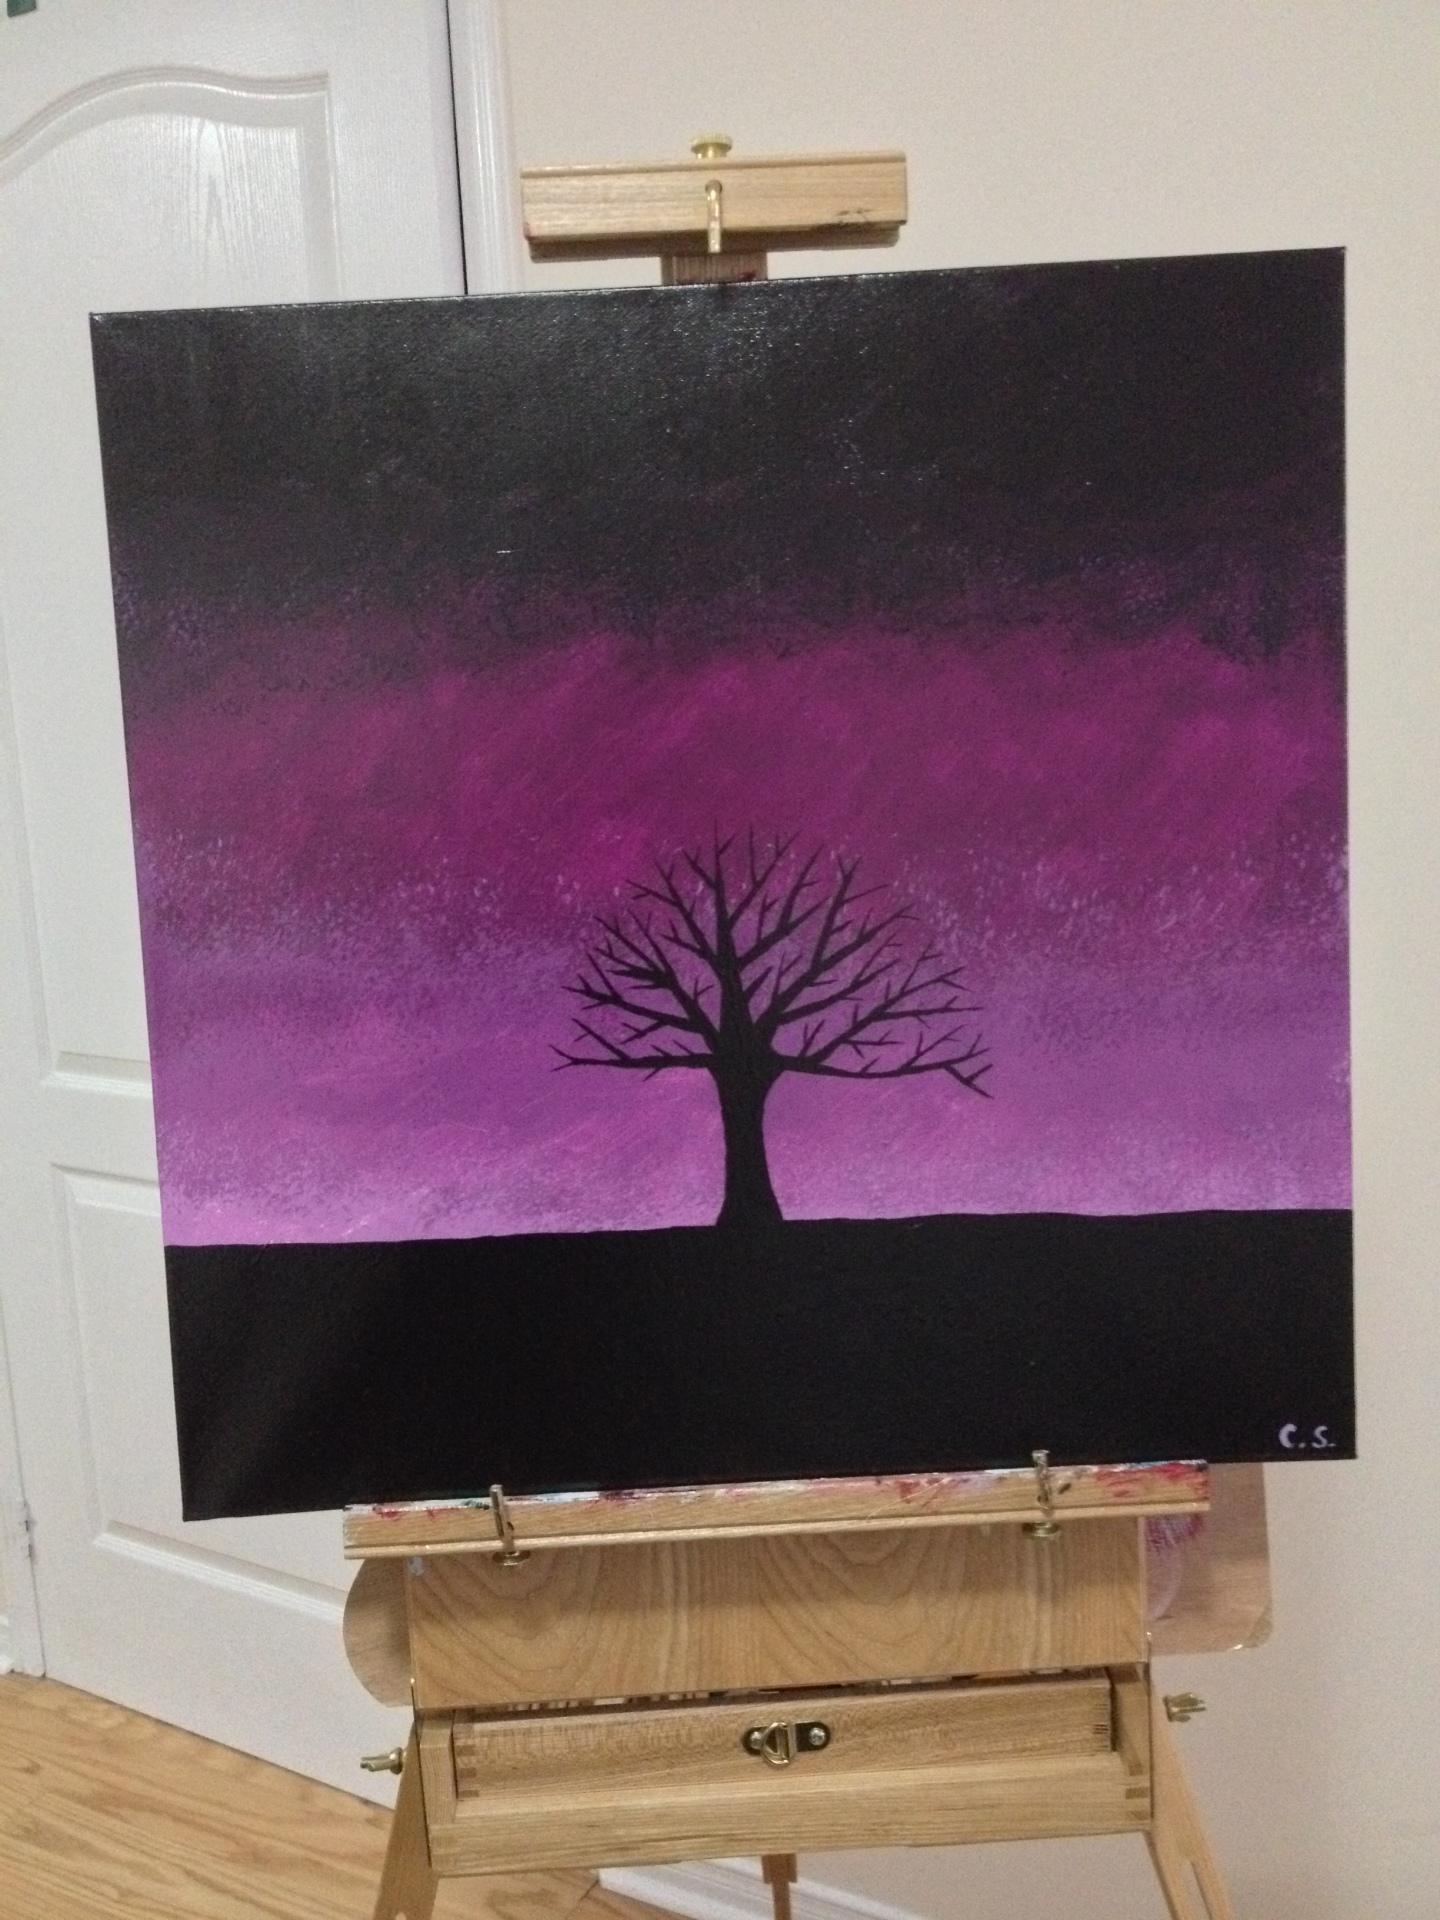 The Tree (Jan 2016)